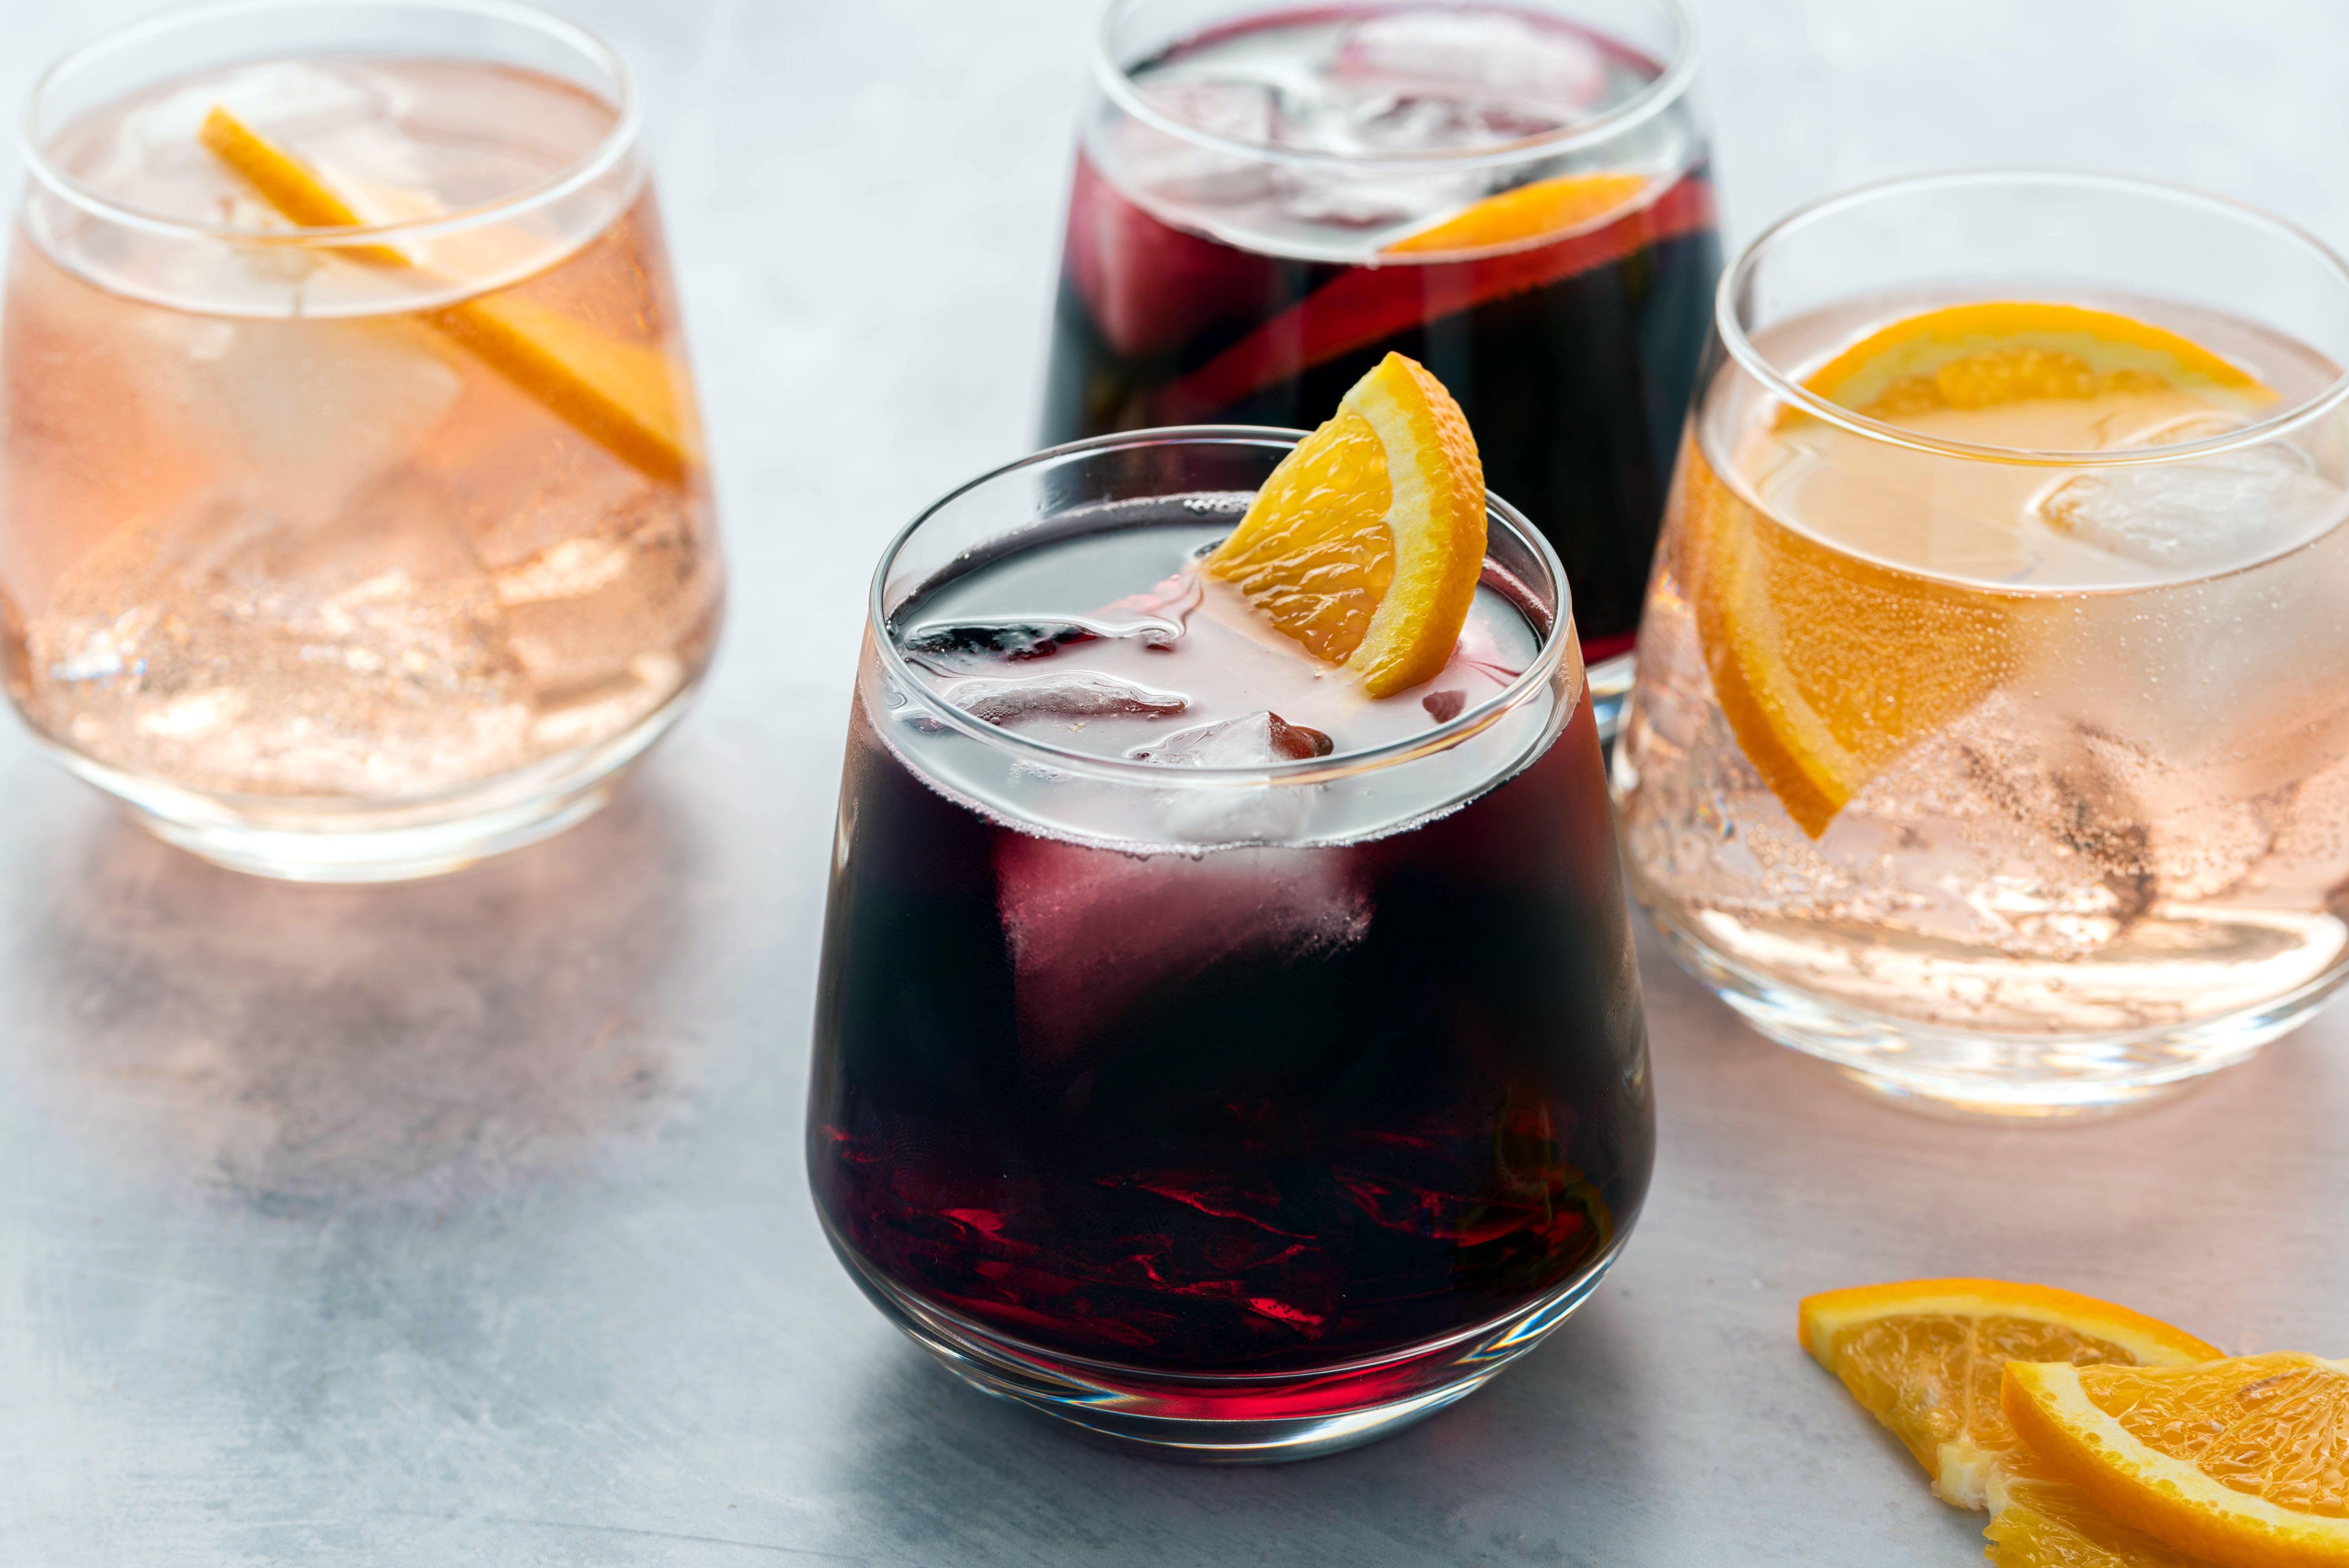 Basic Wine Spritzer Recipe